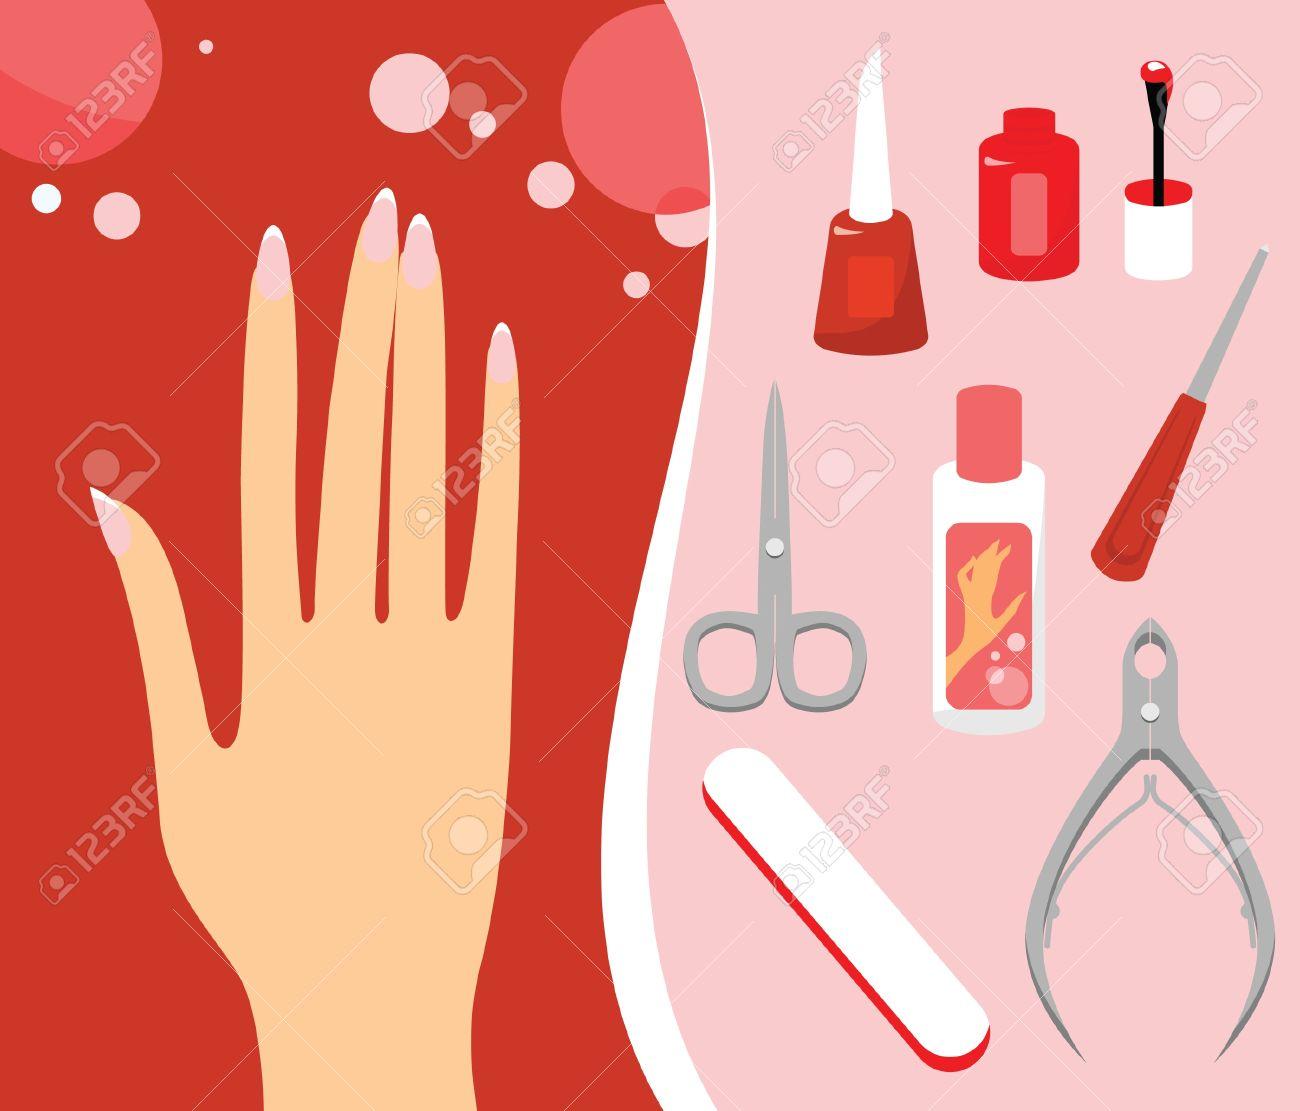 Manicure Clipart #17504